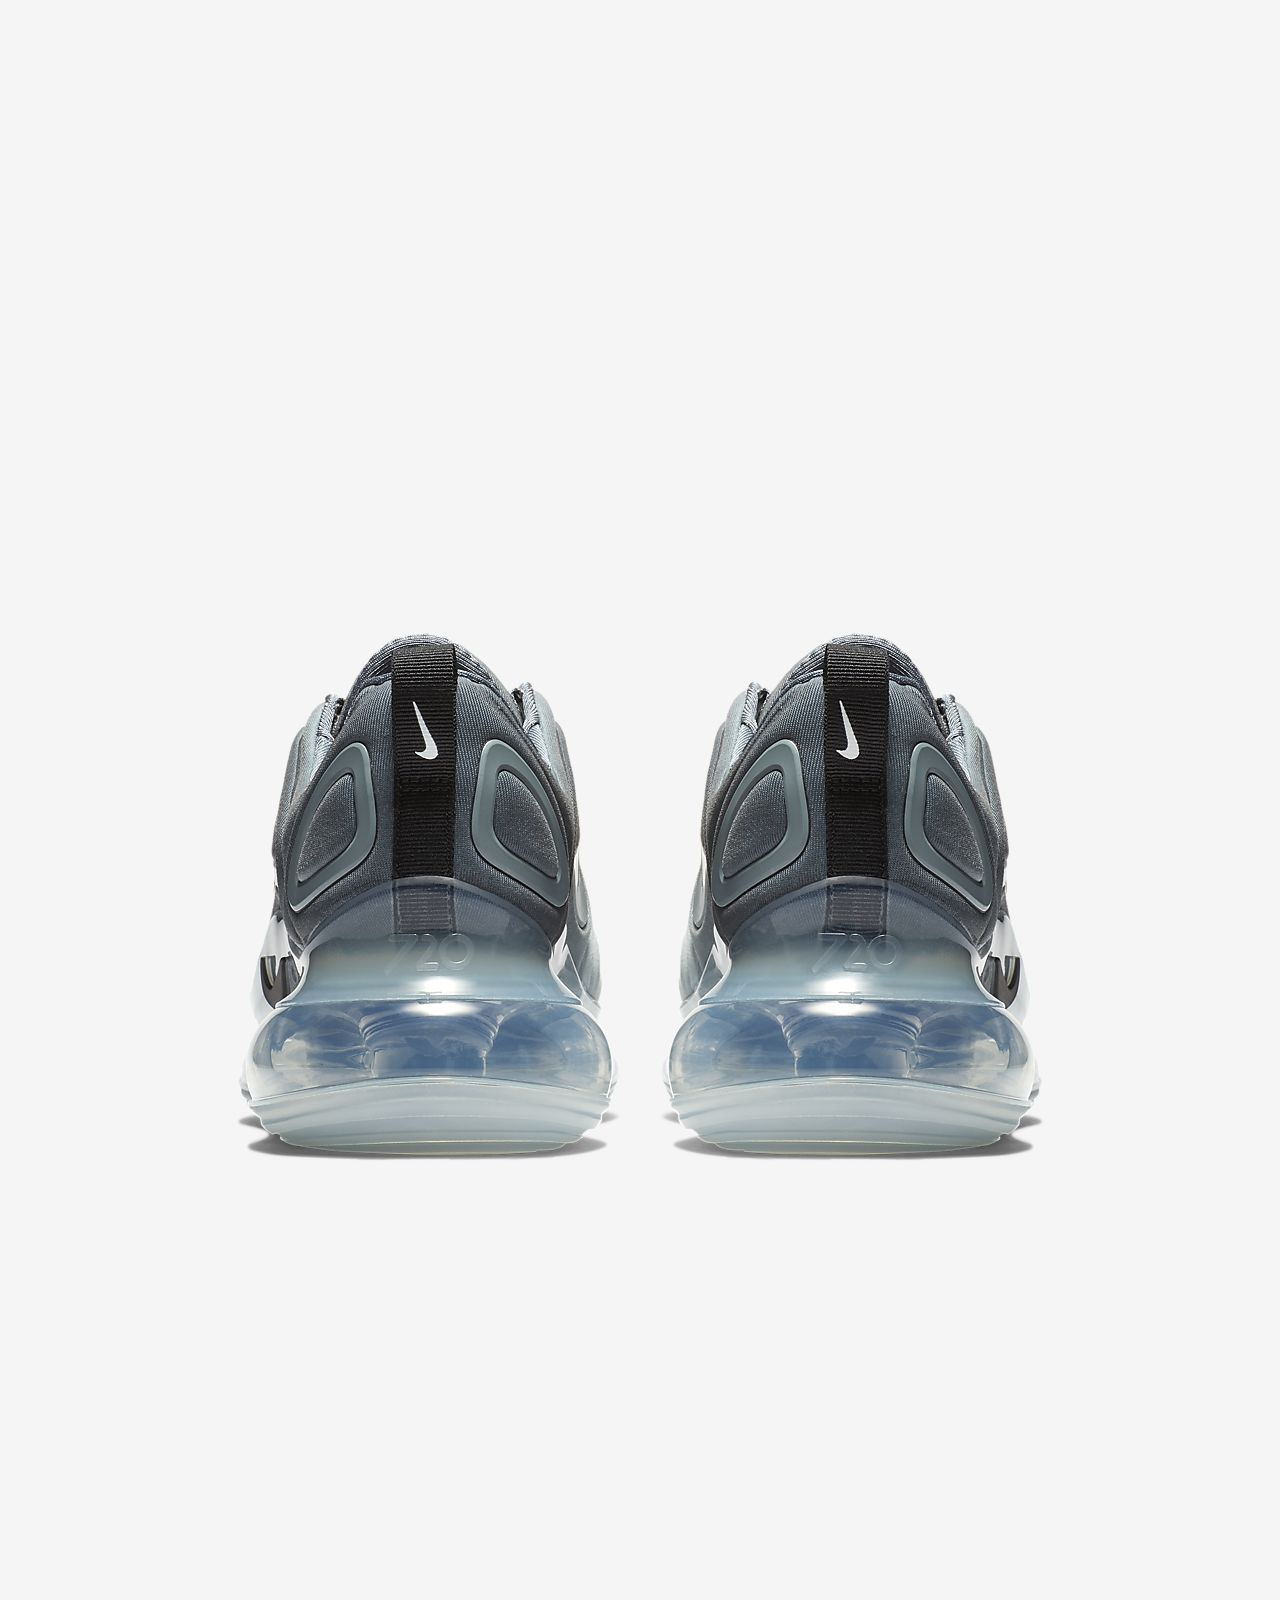 64ecaaa814a3 Nike Air Max 720 Women s Shoe. Nike.com NL